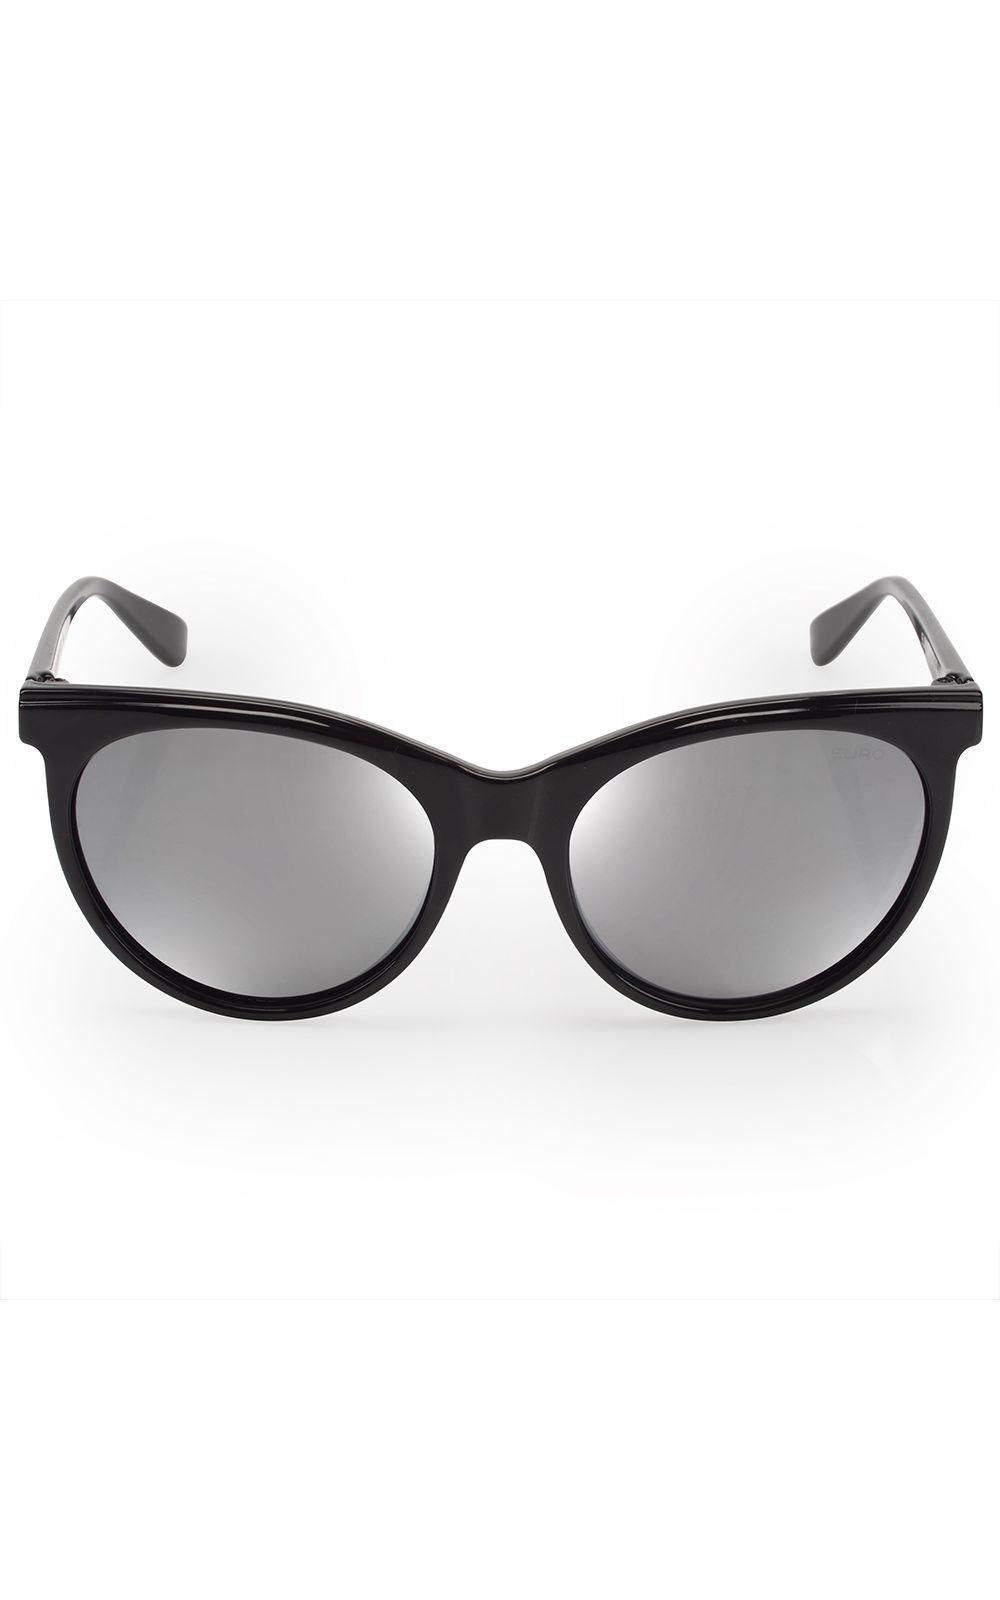 Foto 1 - Óculos Euro Feminino Classic Cat Preto E0022A0209/8P